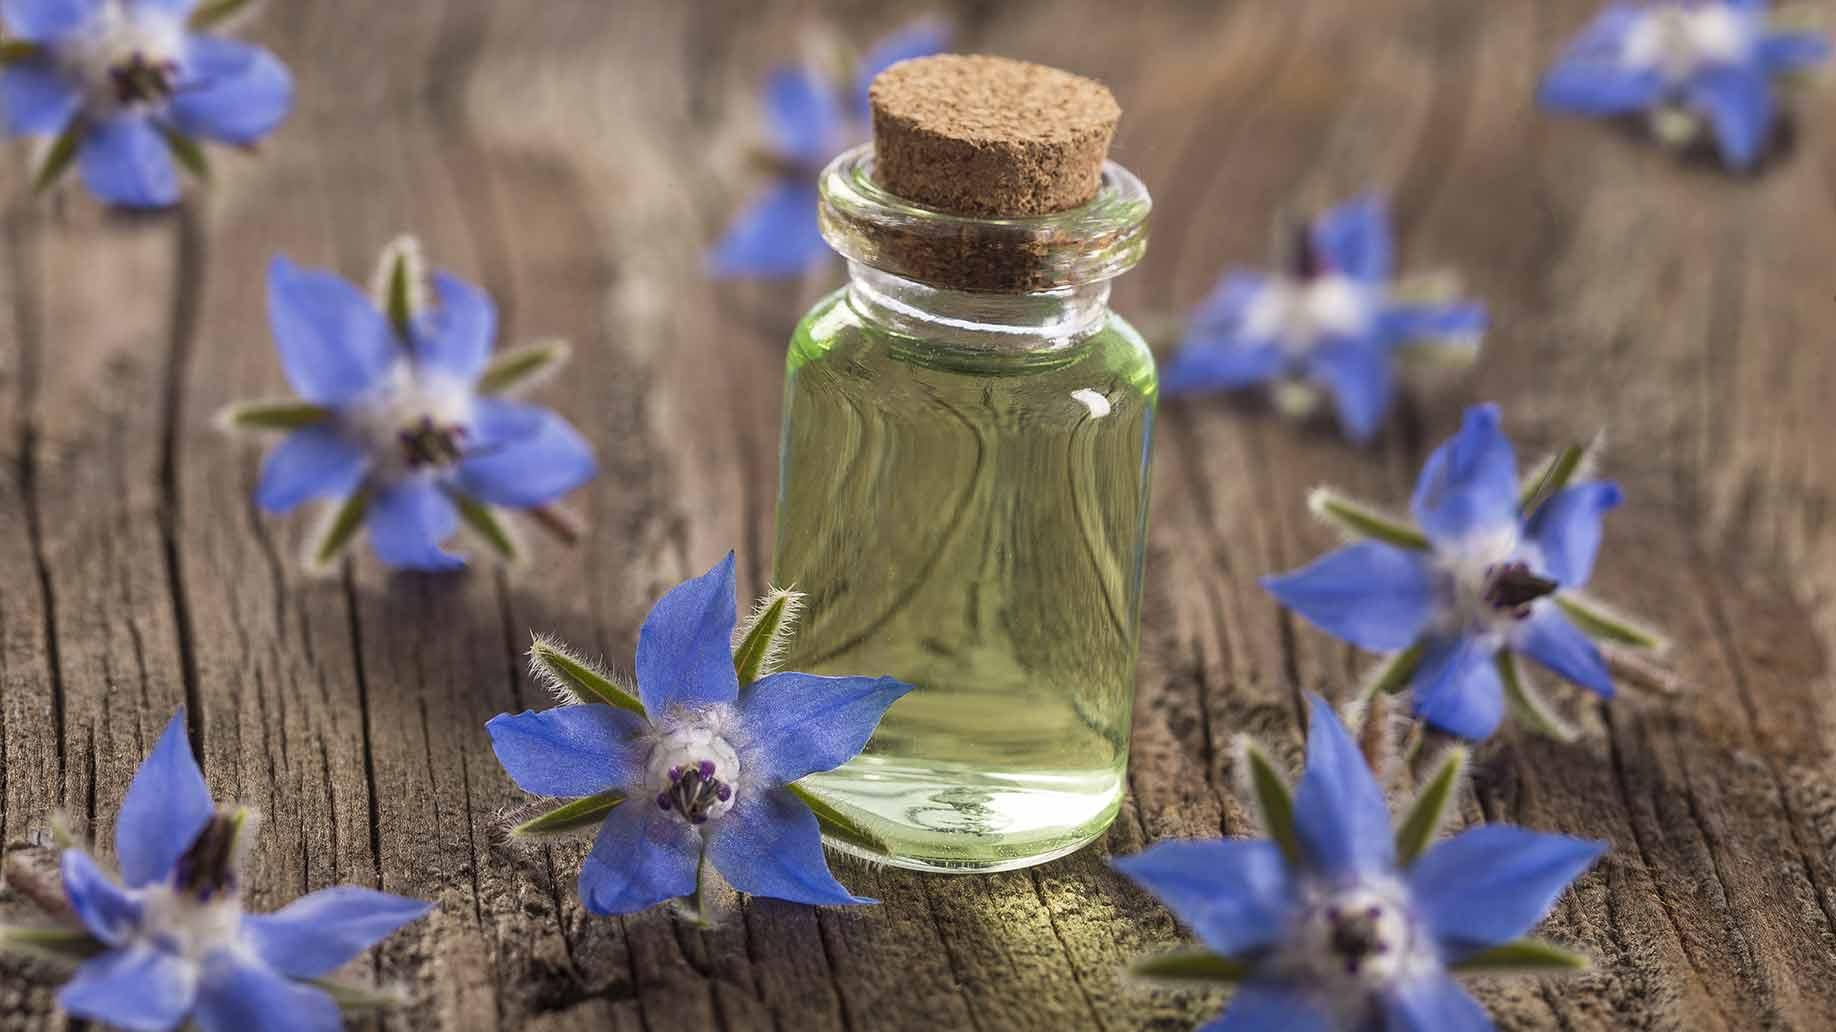 borage seed oil flowers arthritis natural remedies